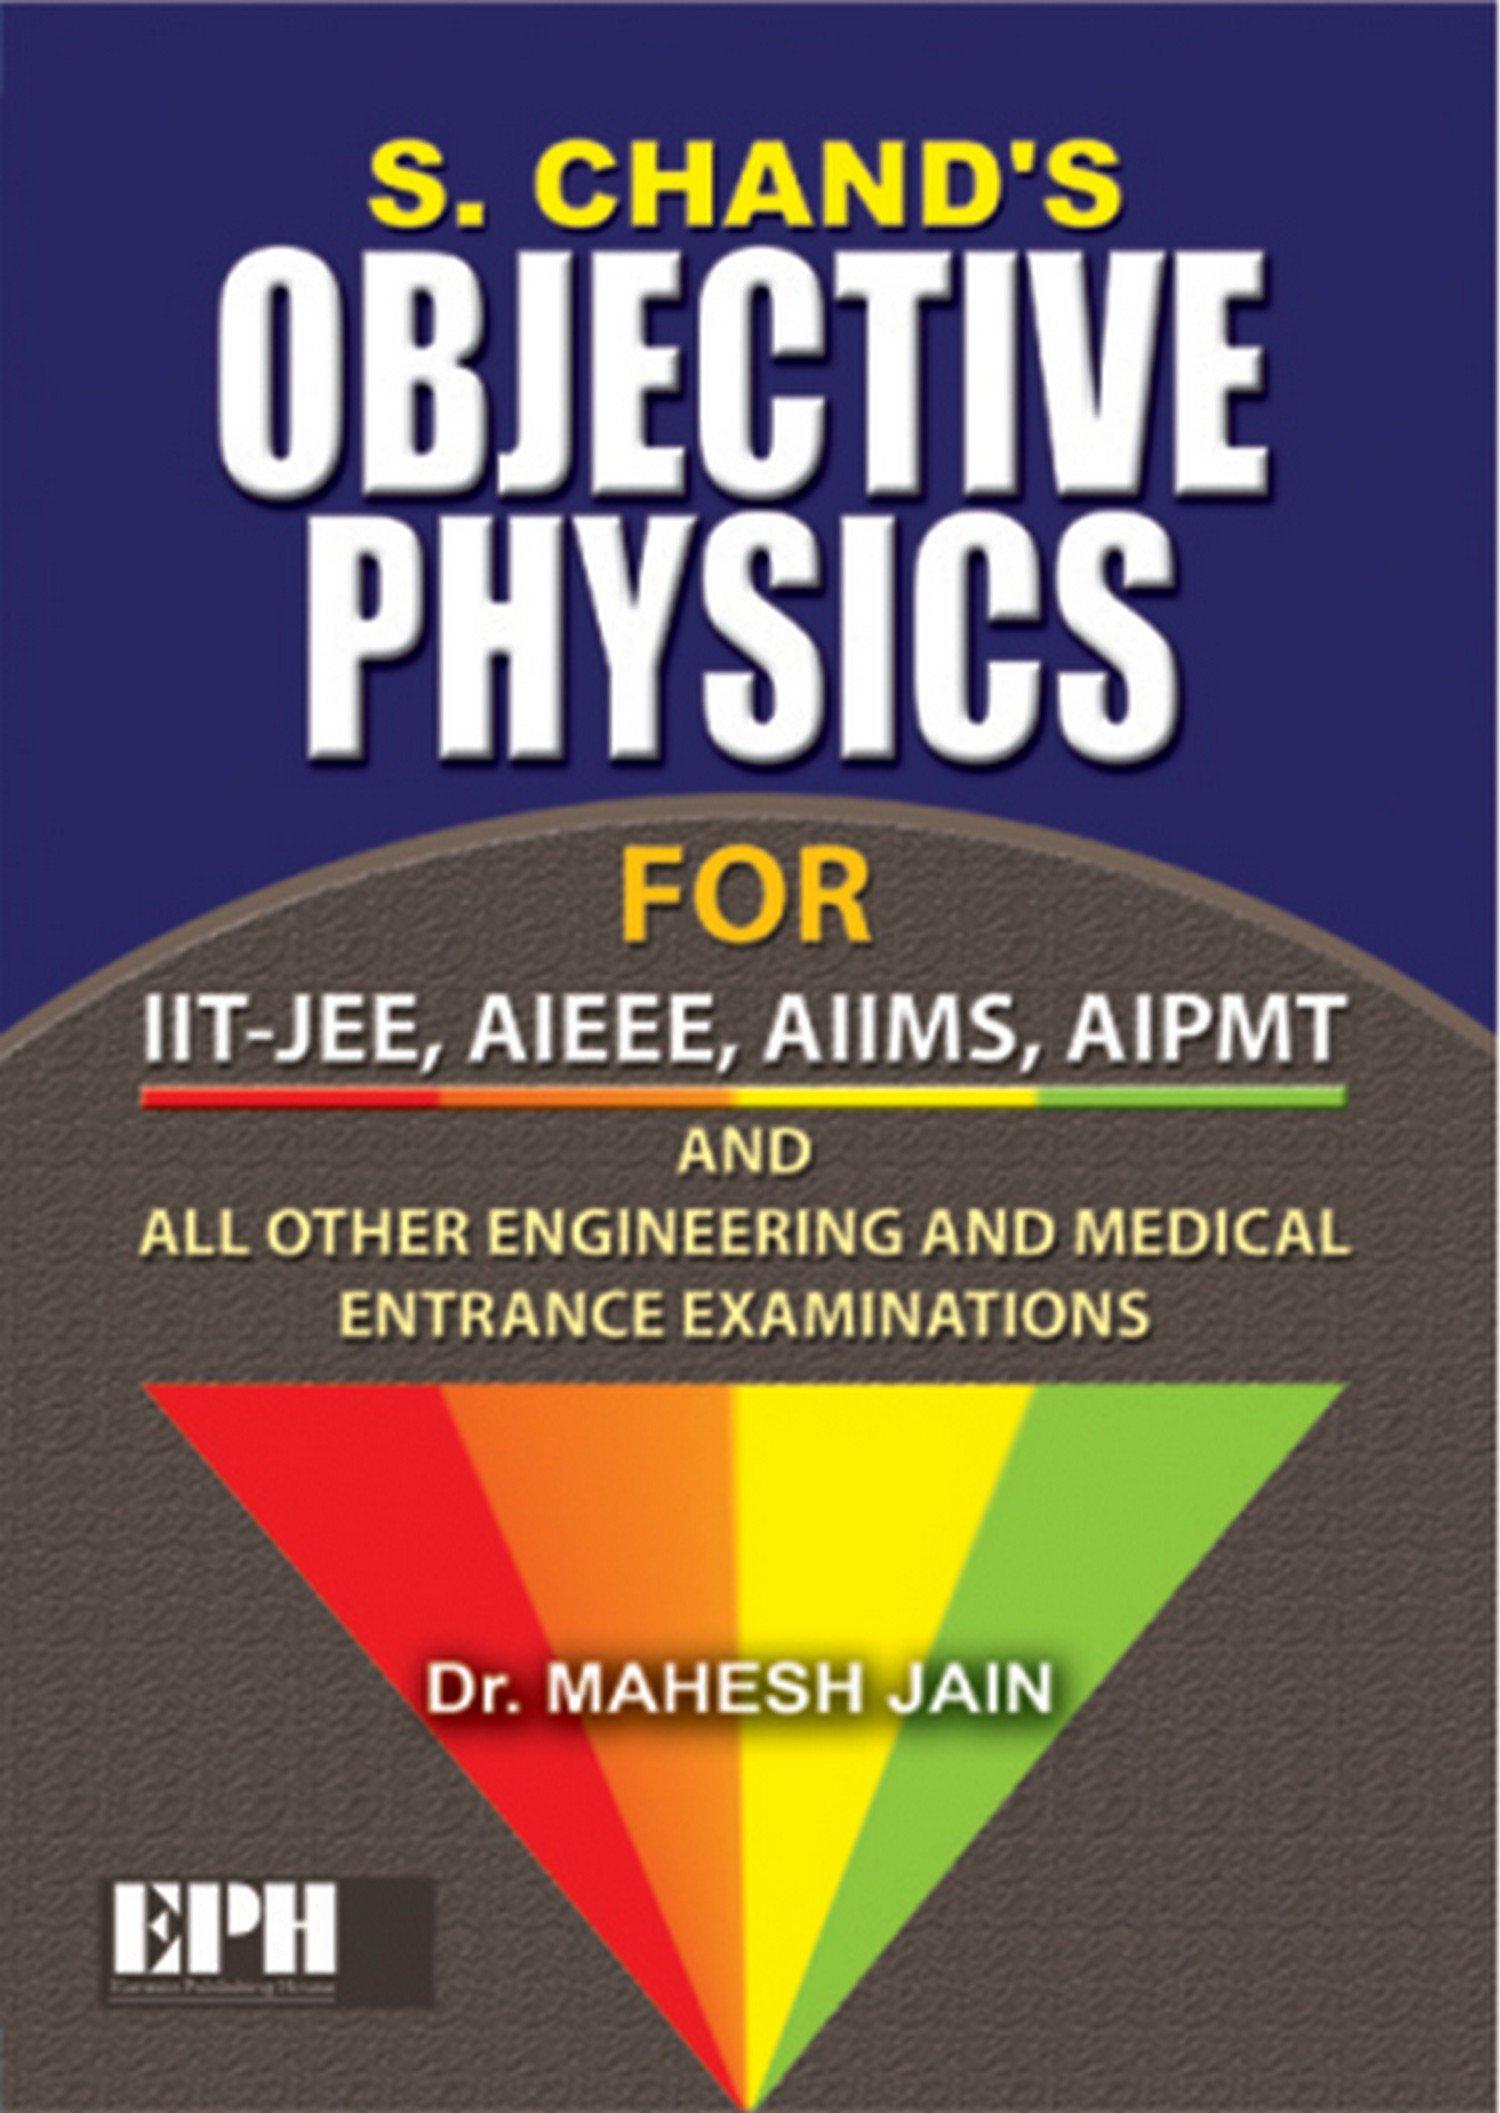 Pradeep's objective physics for jee-main jee-advance 20.